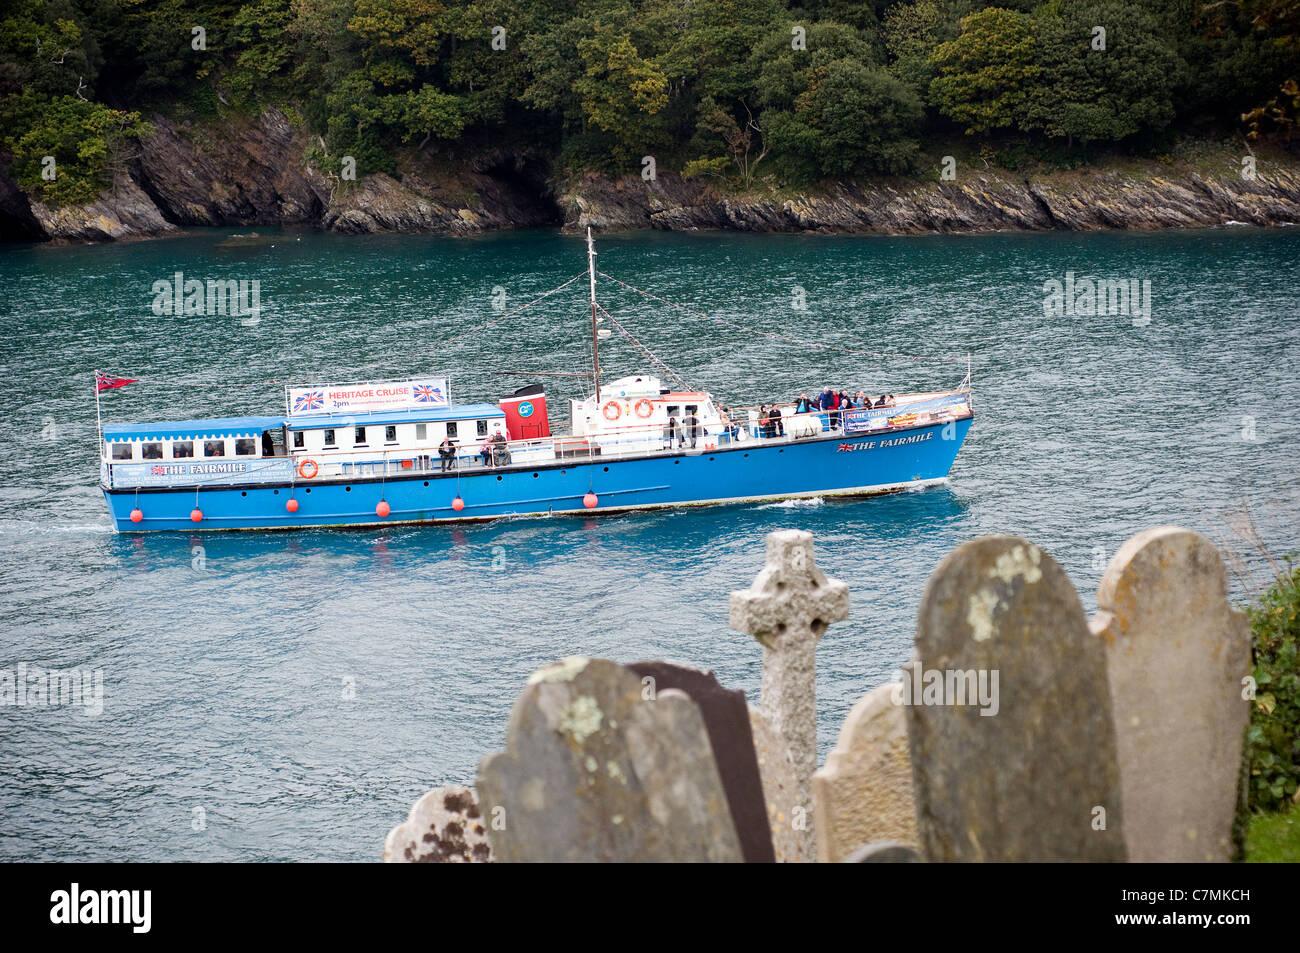 Fairmile passenger tourist ship passes Dartmouth Castle in Dart estuary Dartmouth, Devon England UK GB built by - Stock Image